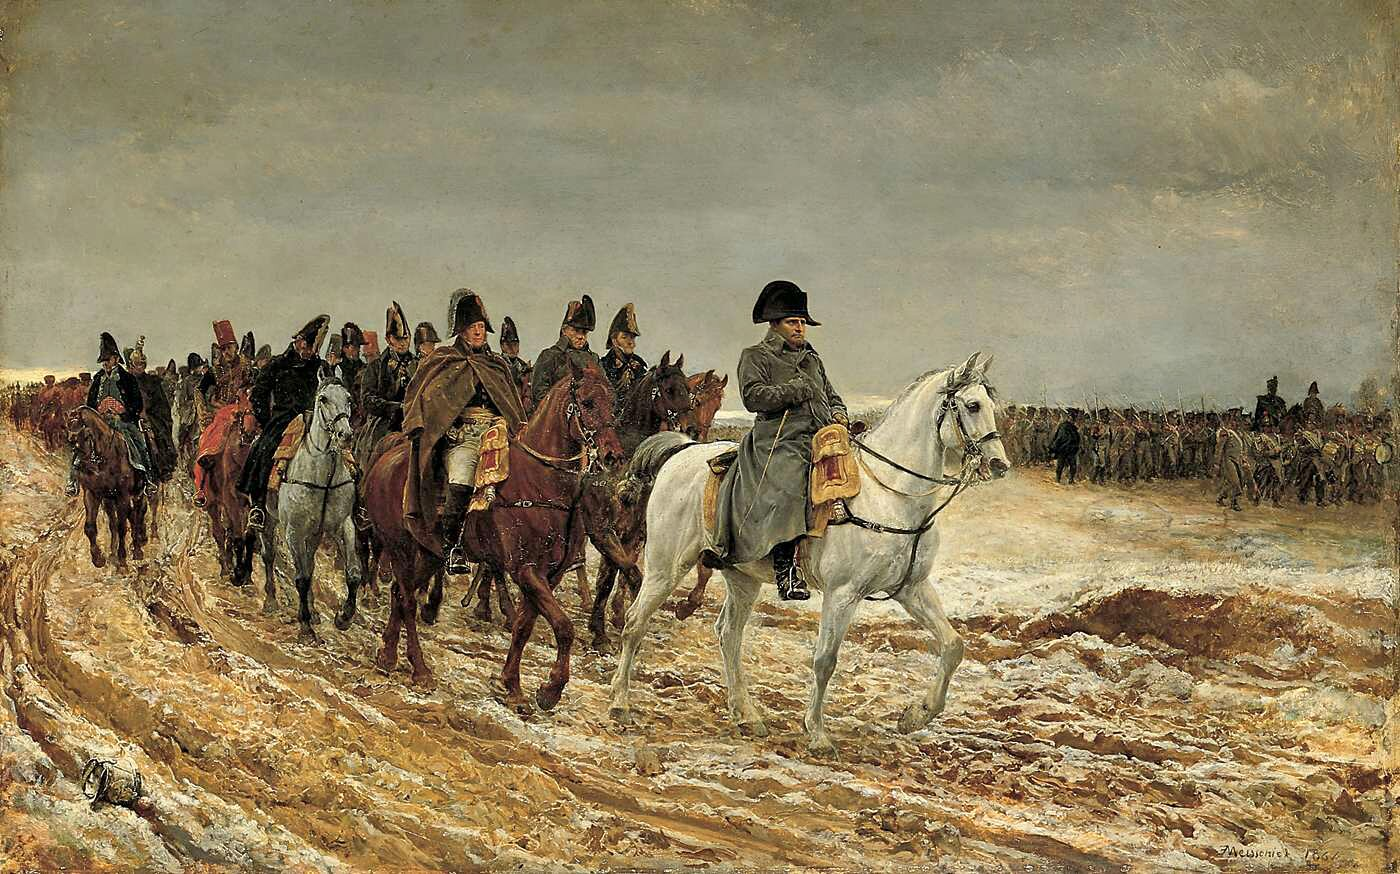 Kampania francuska 1814 Źródło: Jean-Louis-Ernest Meissonier, Kampania francuska 1814, 1864, olej na desce, Musée d'Orsay, Paryż, domena publiczna.